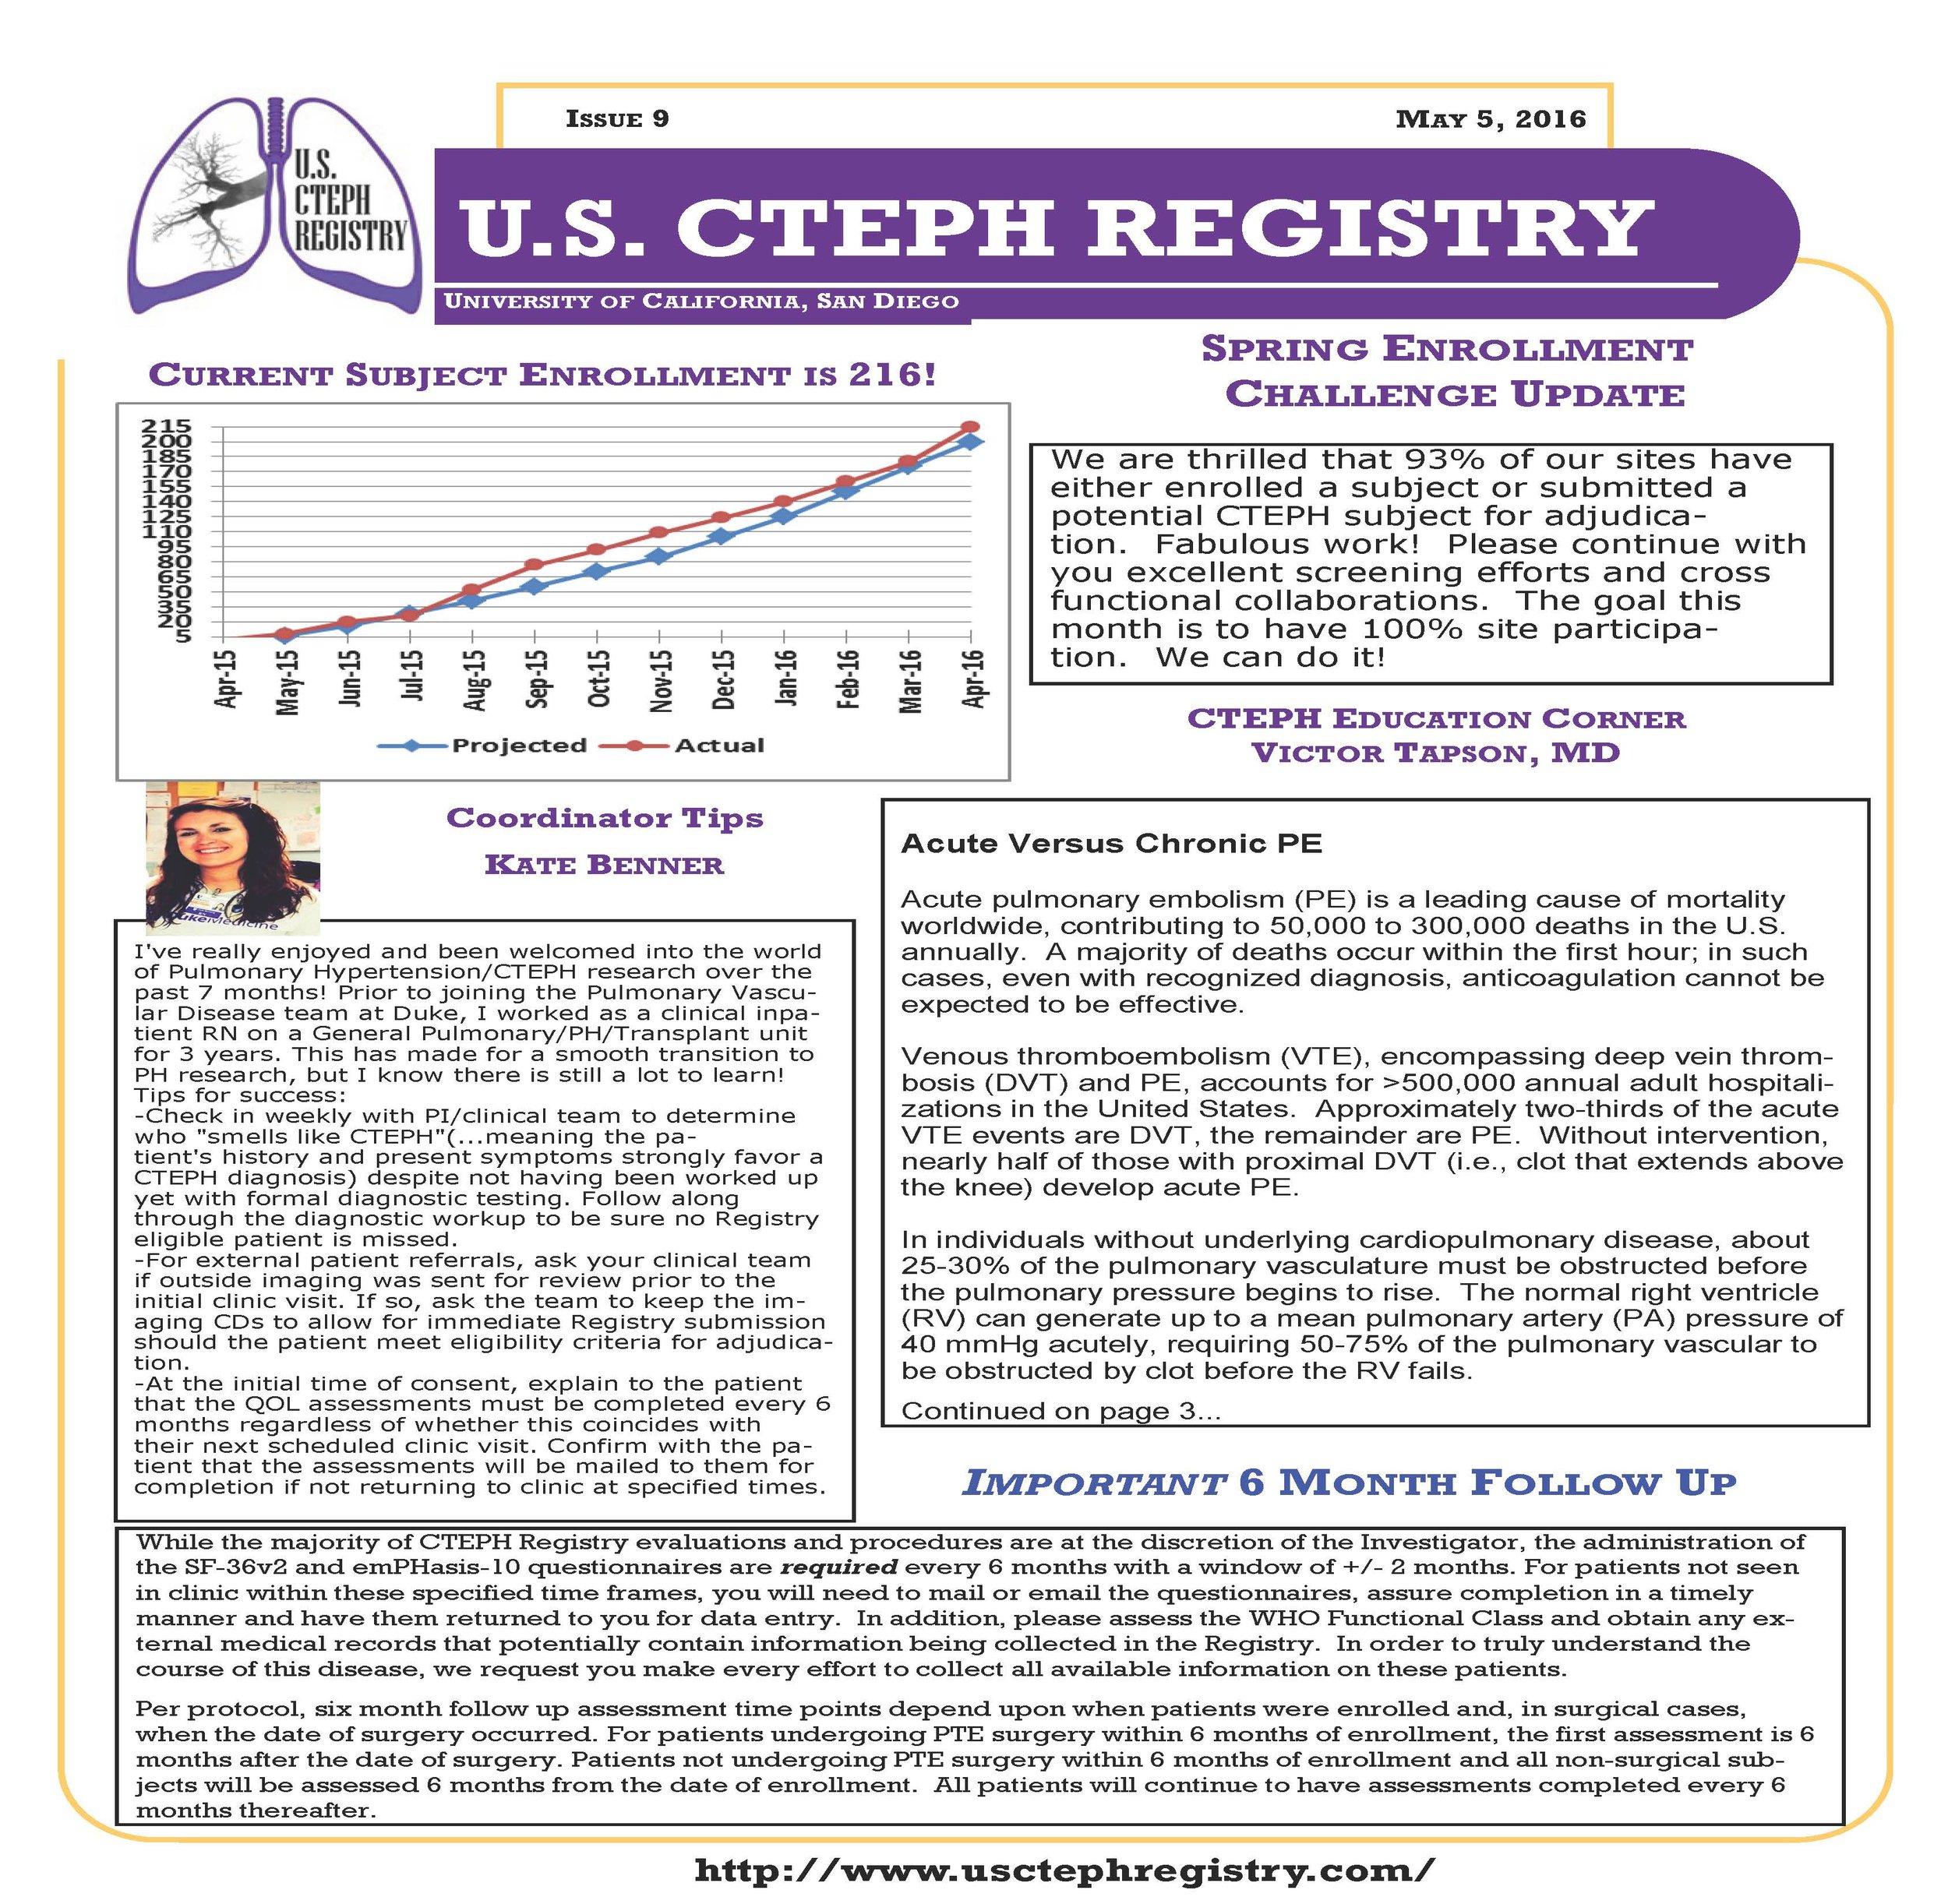 CTEPH Newsletter 5.5.2016_Page_1.jpg